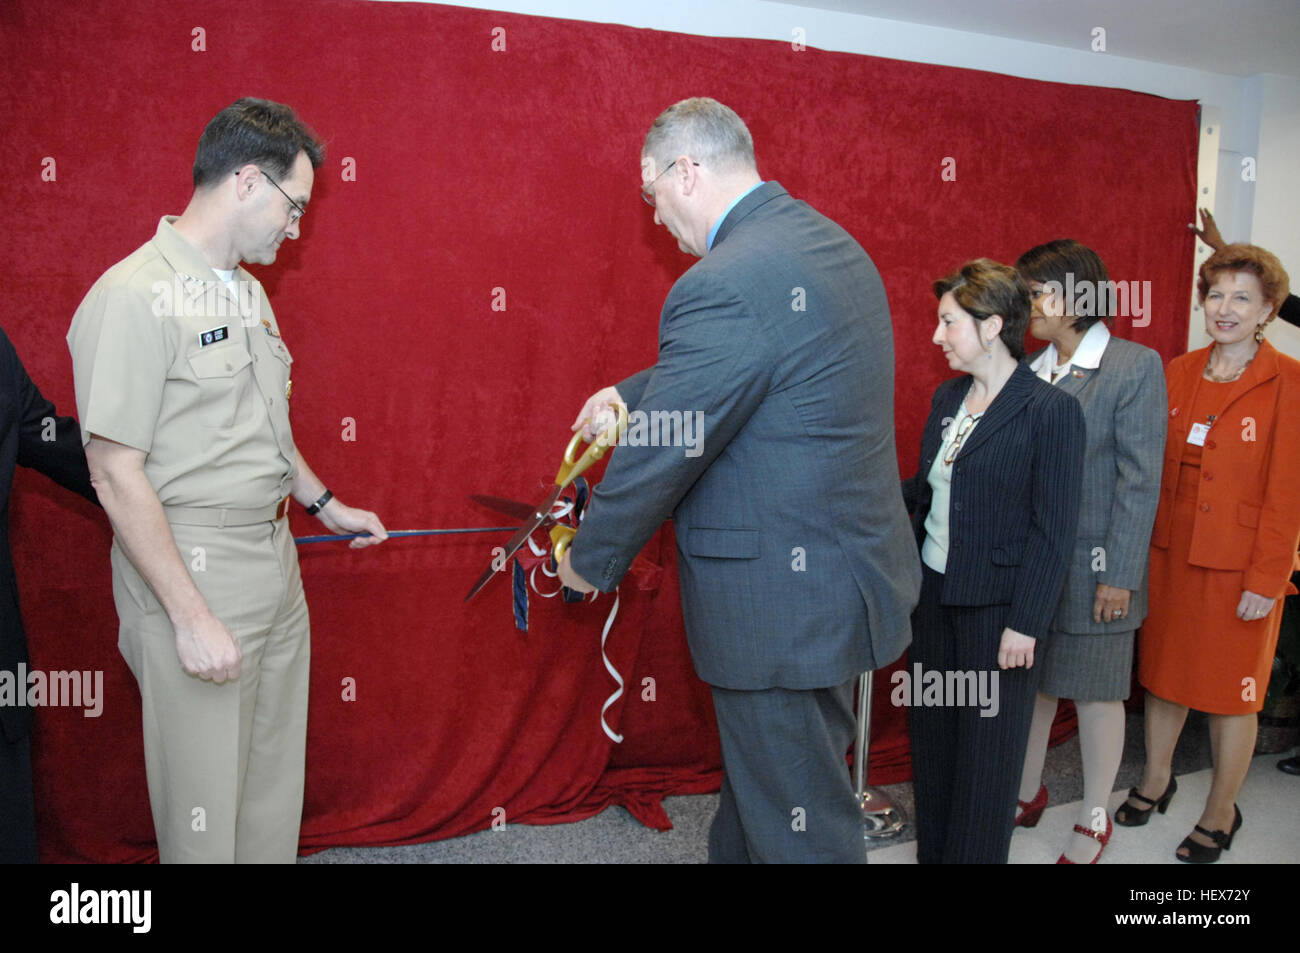 101115-N-8732C-013  WASHINGTON (Nov. 15, 2010) – Under Secretary of the Navy Robert O. Work cut the ceremonial ribbon Stock Photo